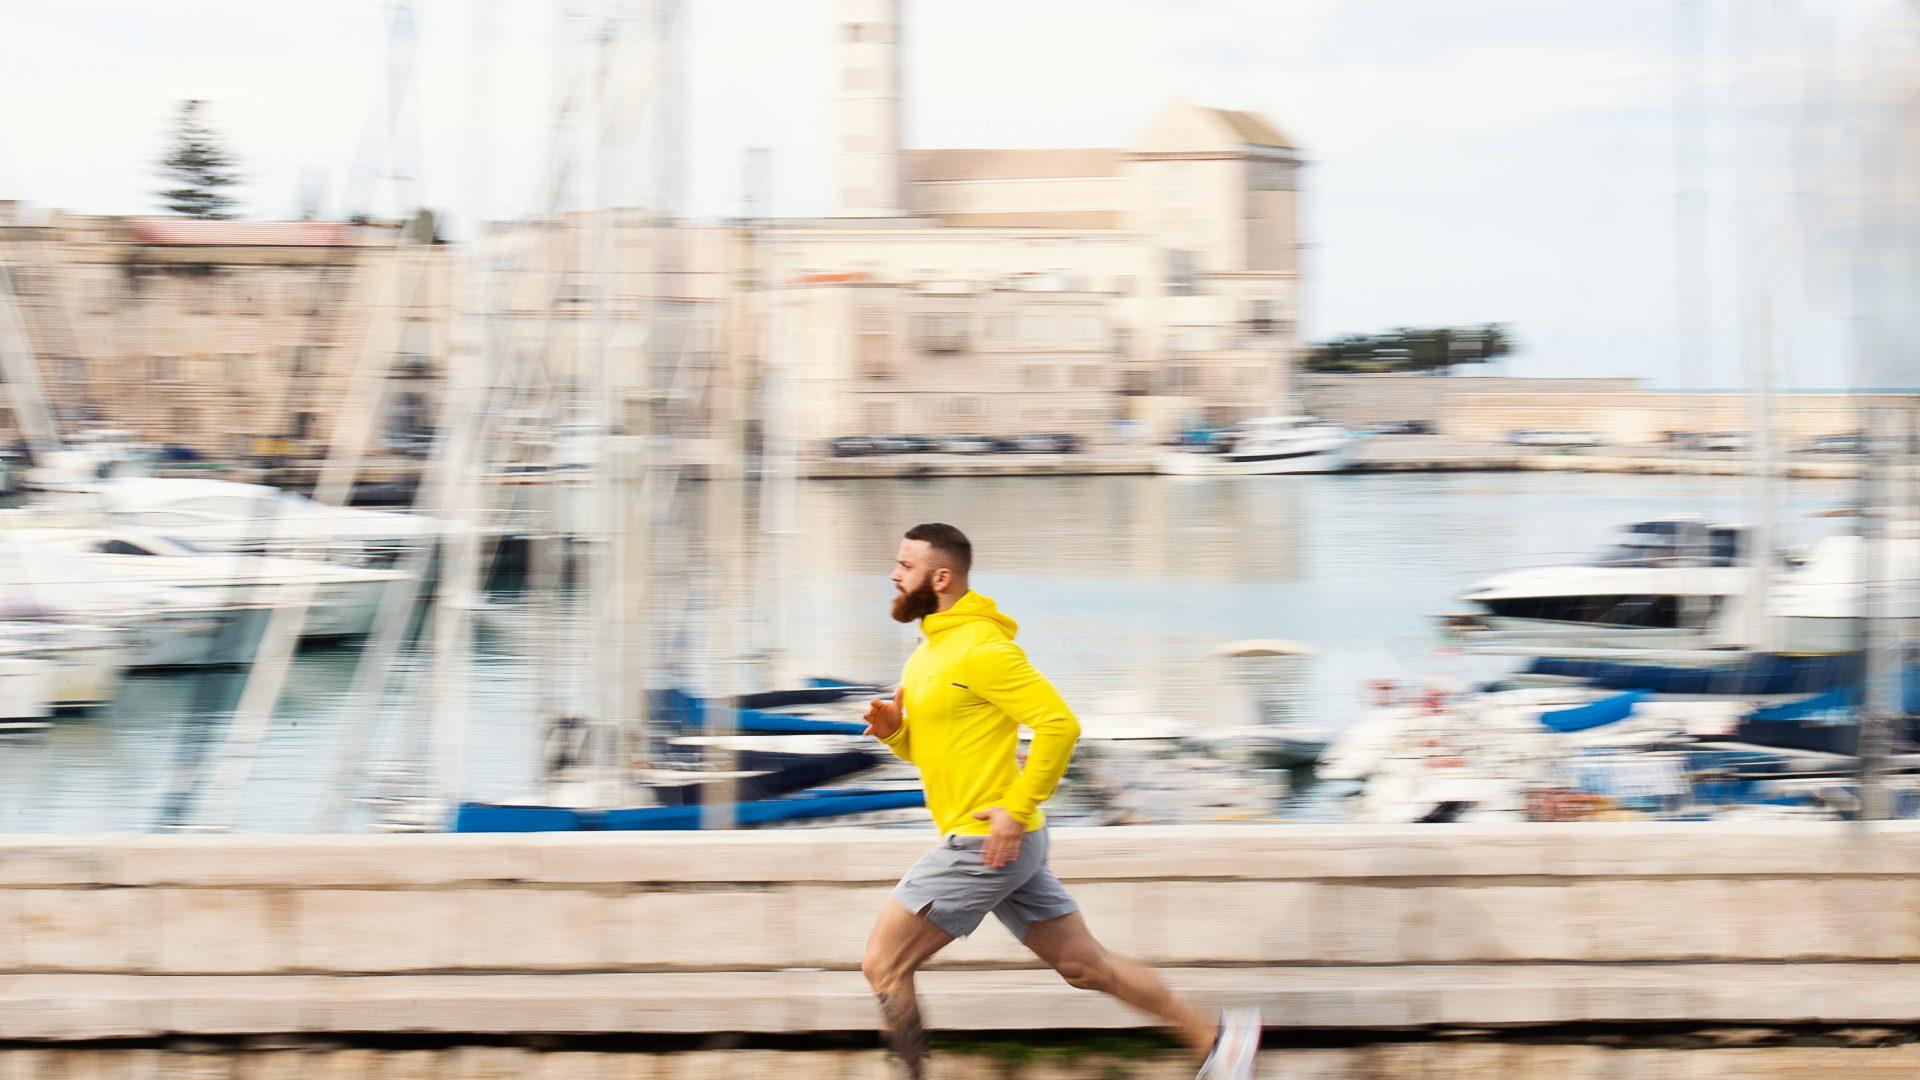 Nico straga - personal trainer - palestra - fitness - allenamento - schede personalizzate - workout - stailienonmollare